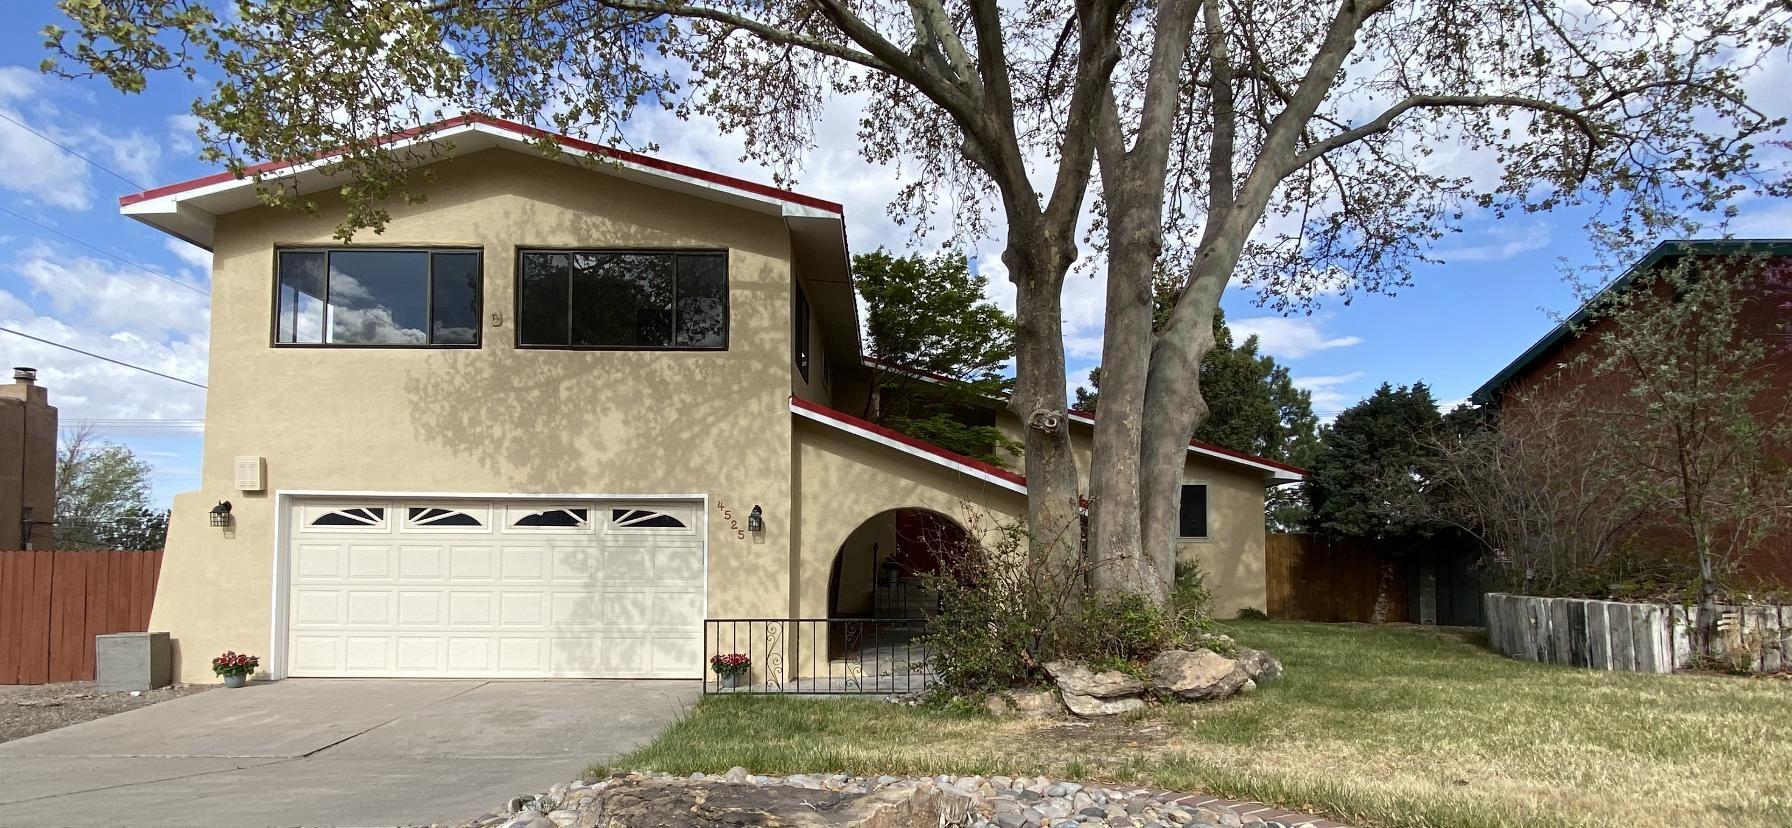 4525 Larchmont Drive NE, Albuquerque, NM 87111 - #: 990327